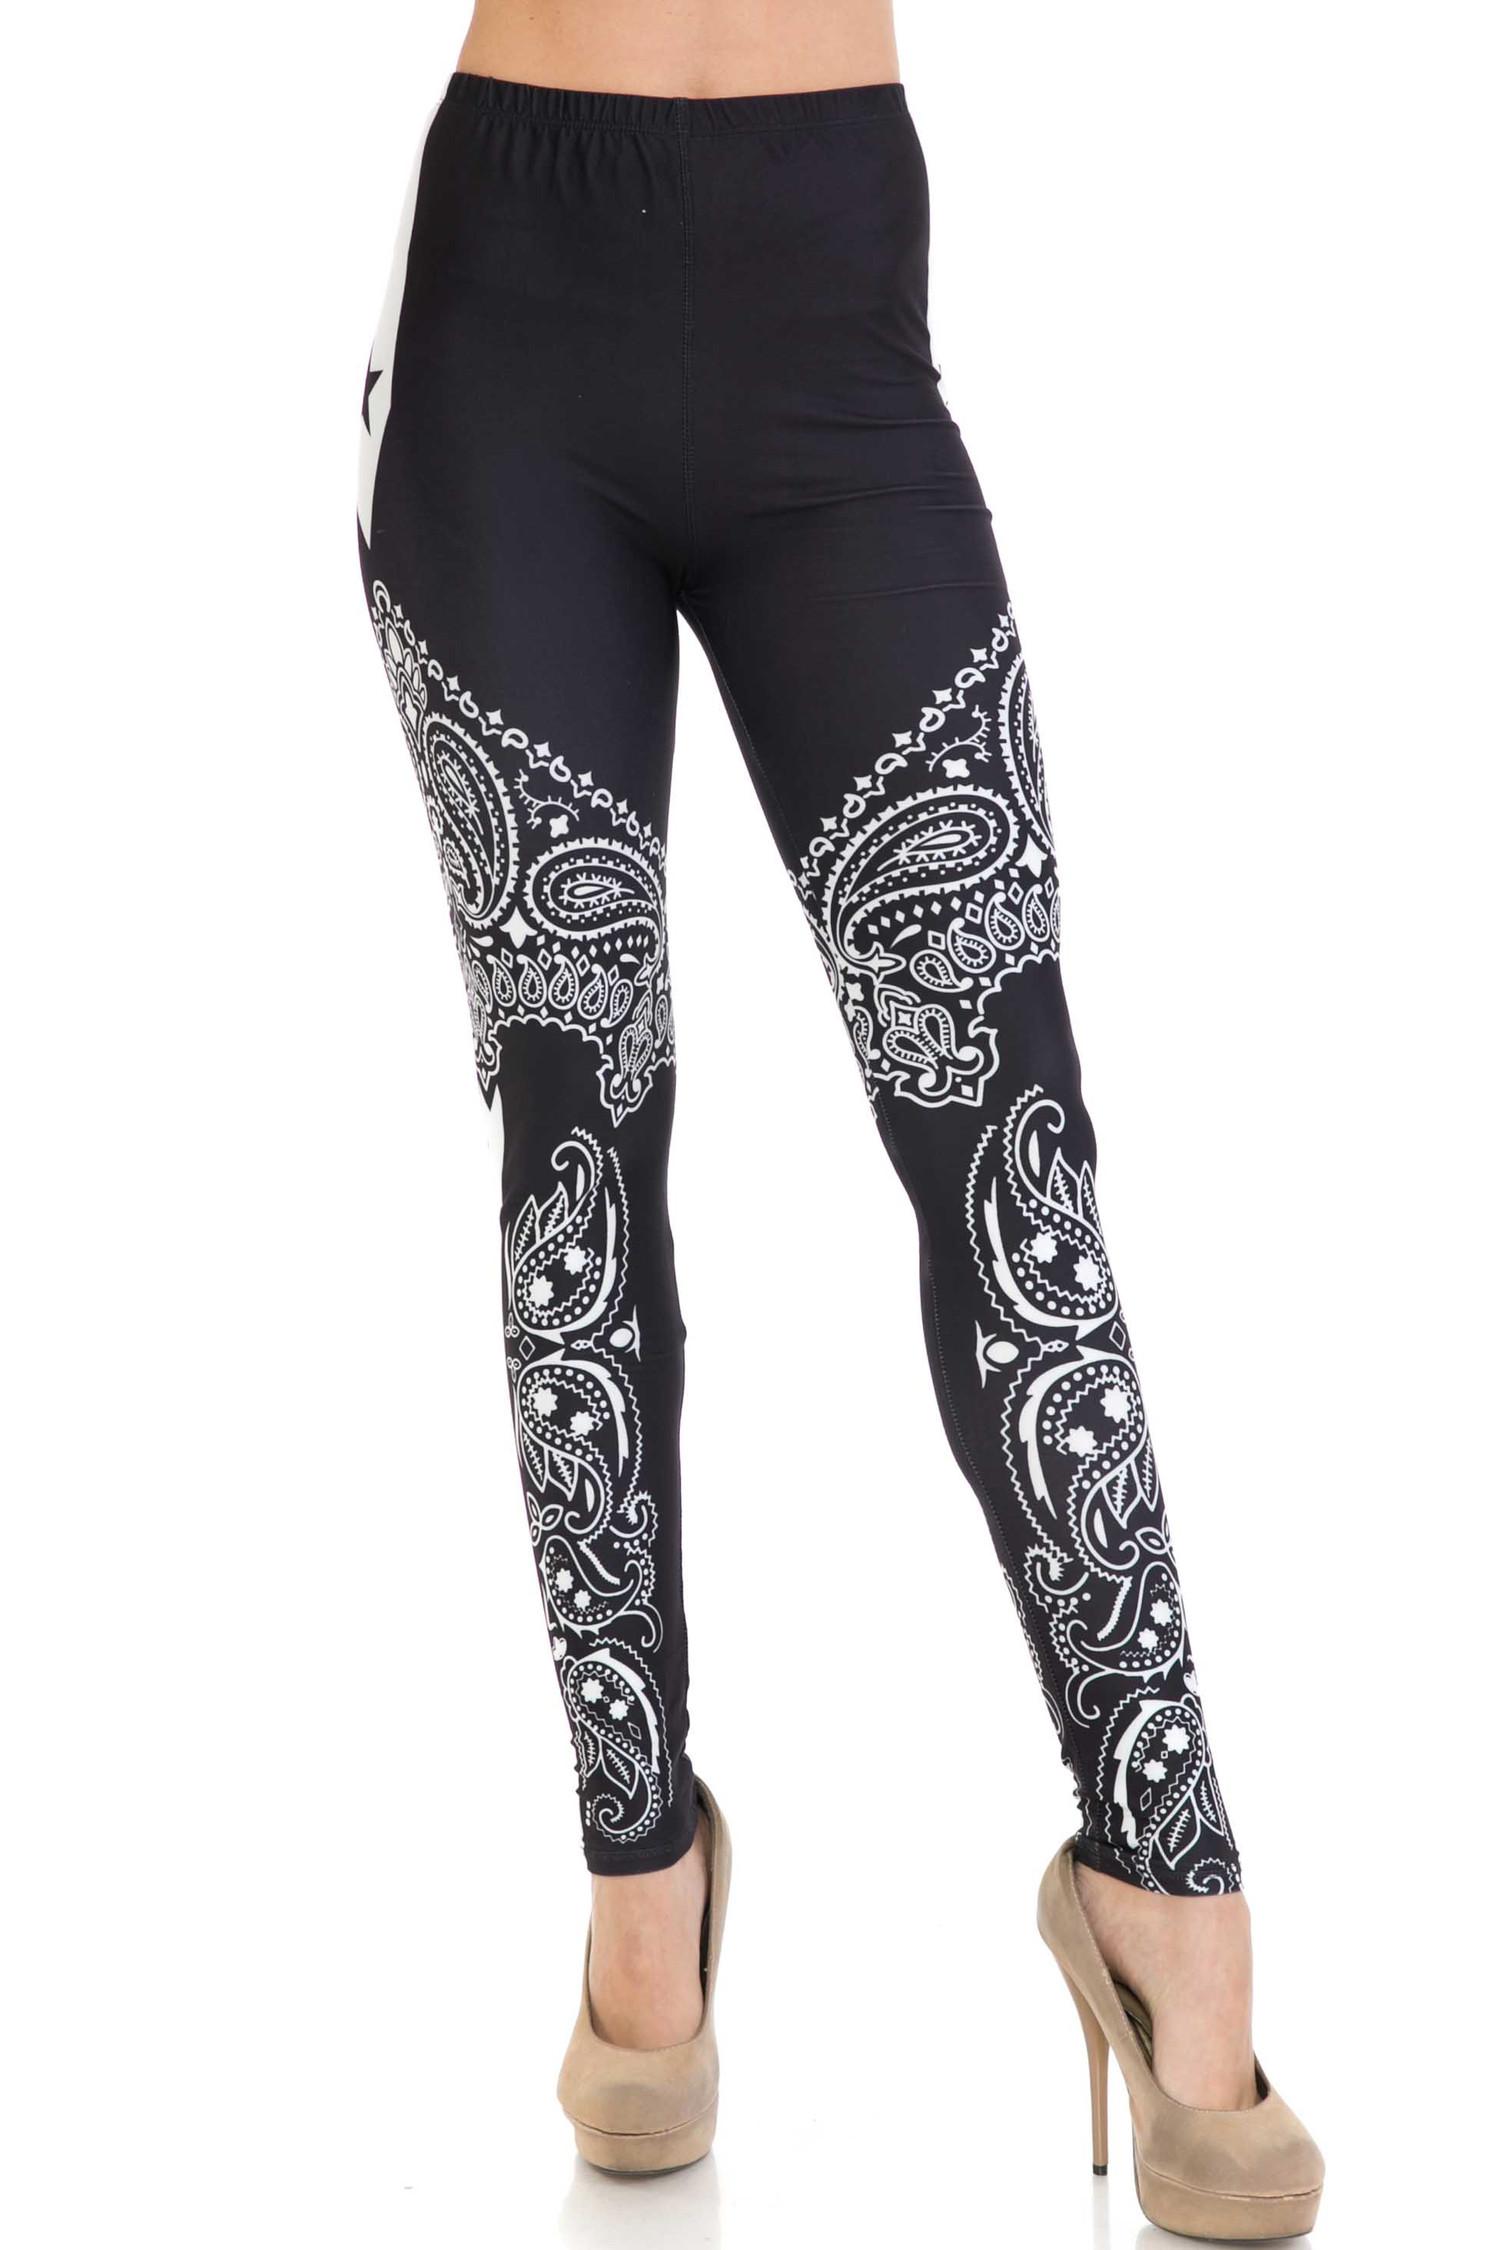 Creamy Soft Bandana Stars Plus Size Leggings - USA Fashion™